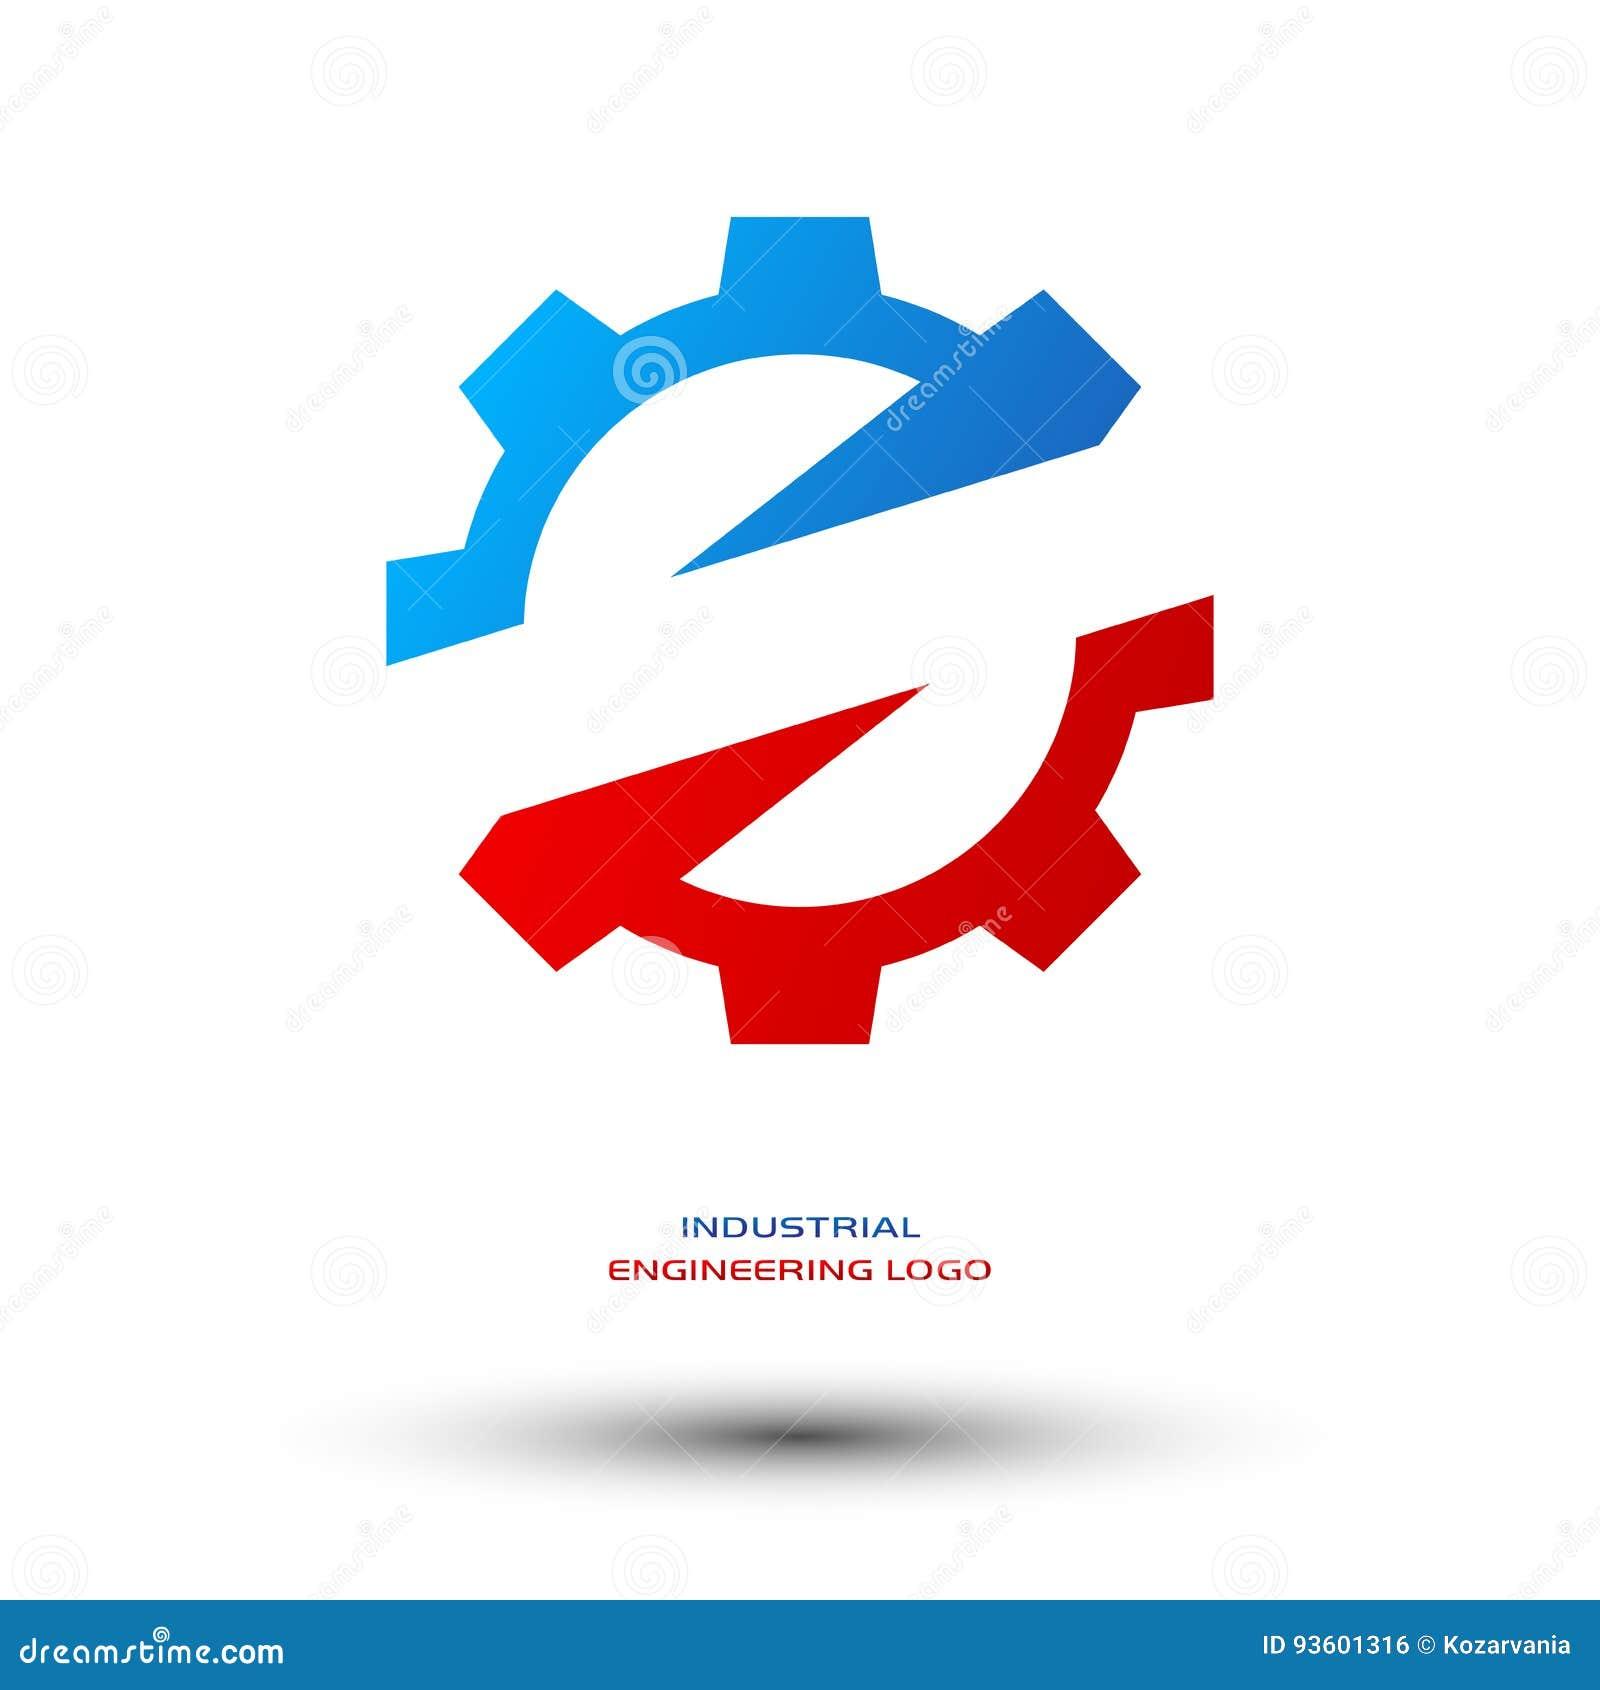 Stock Market Logo Design